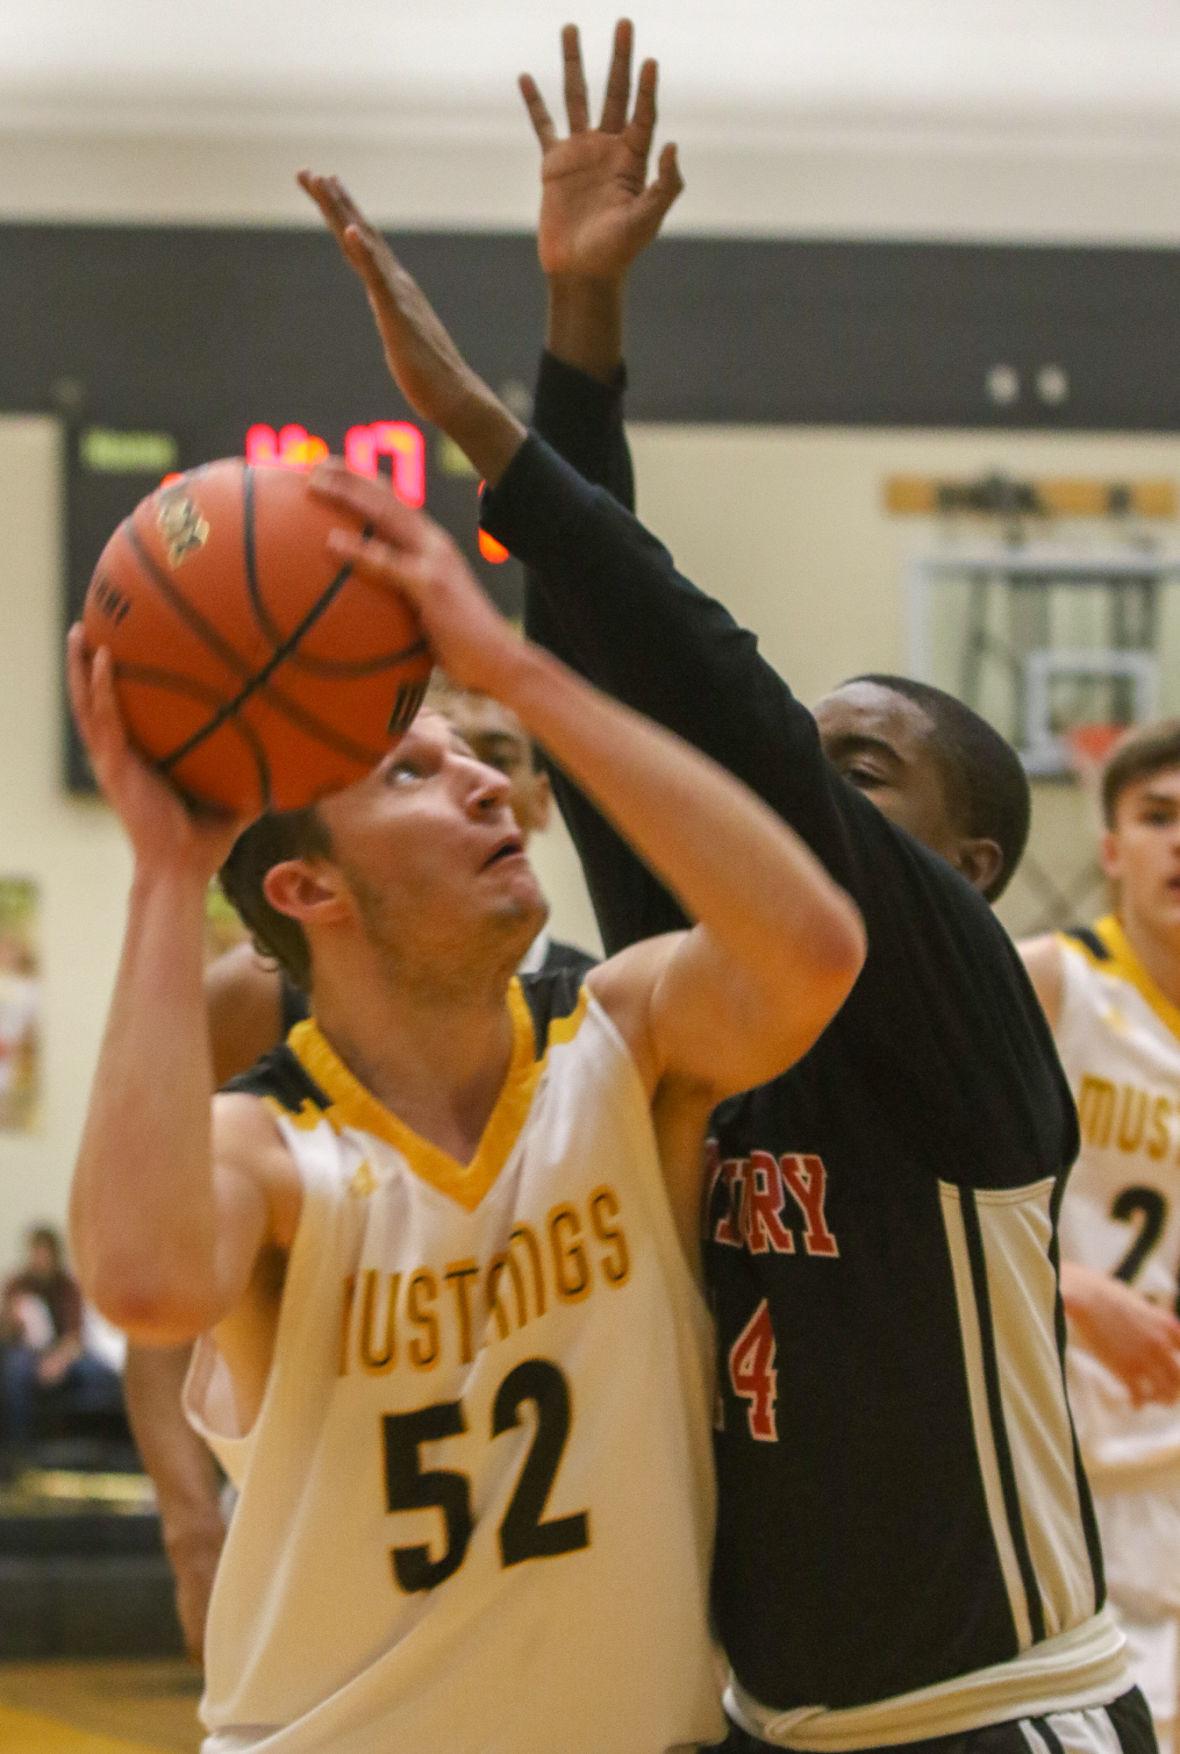 Boys basketball - 21st Century at Kouts